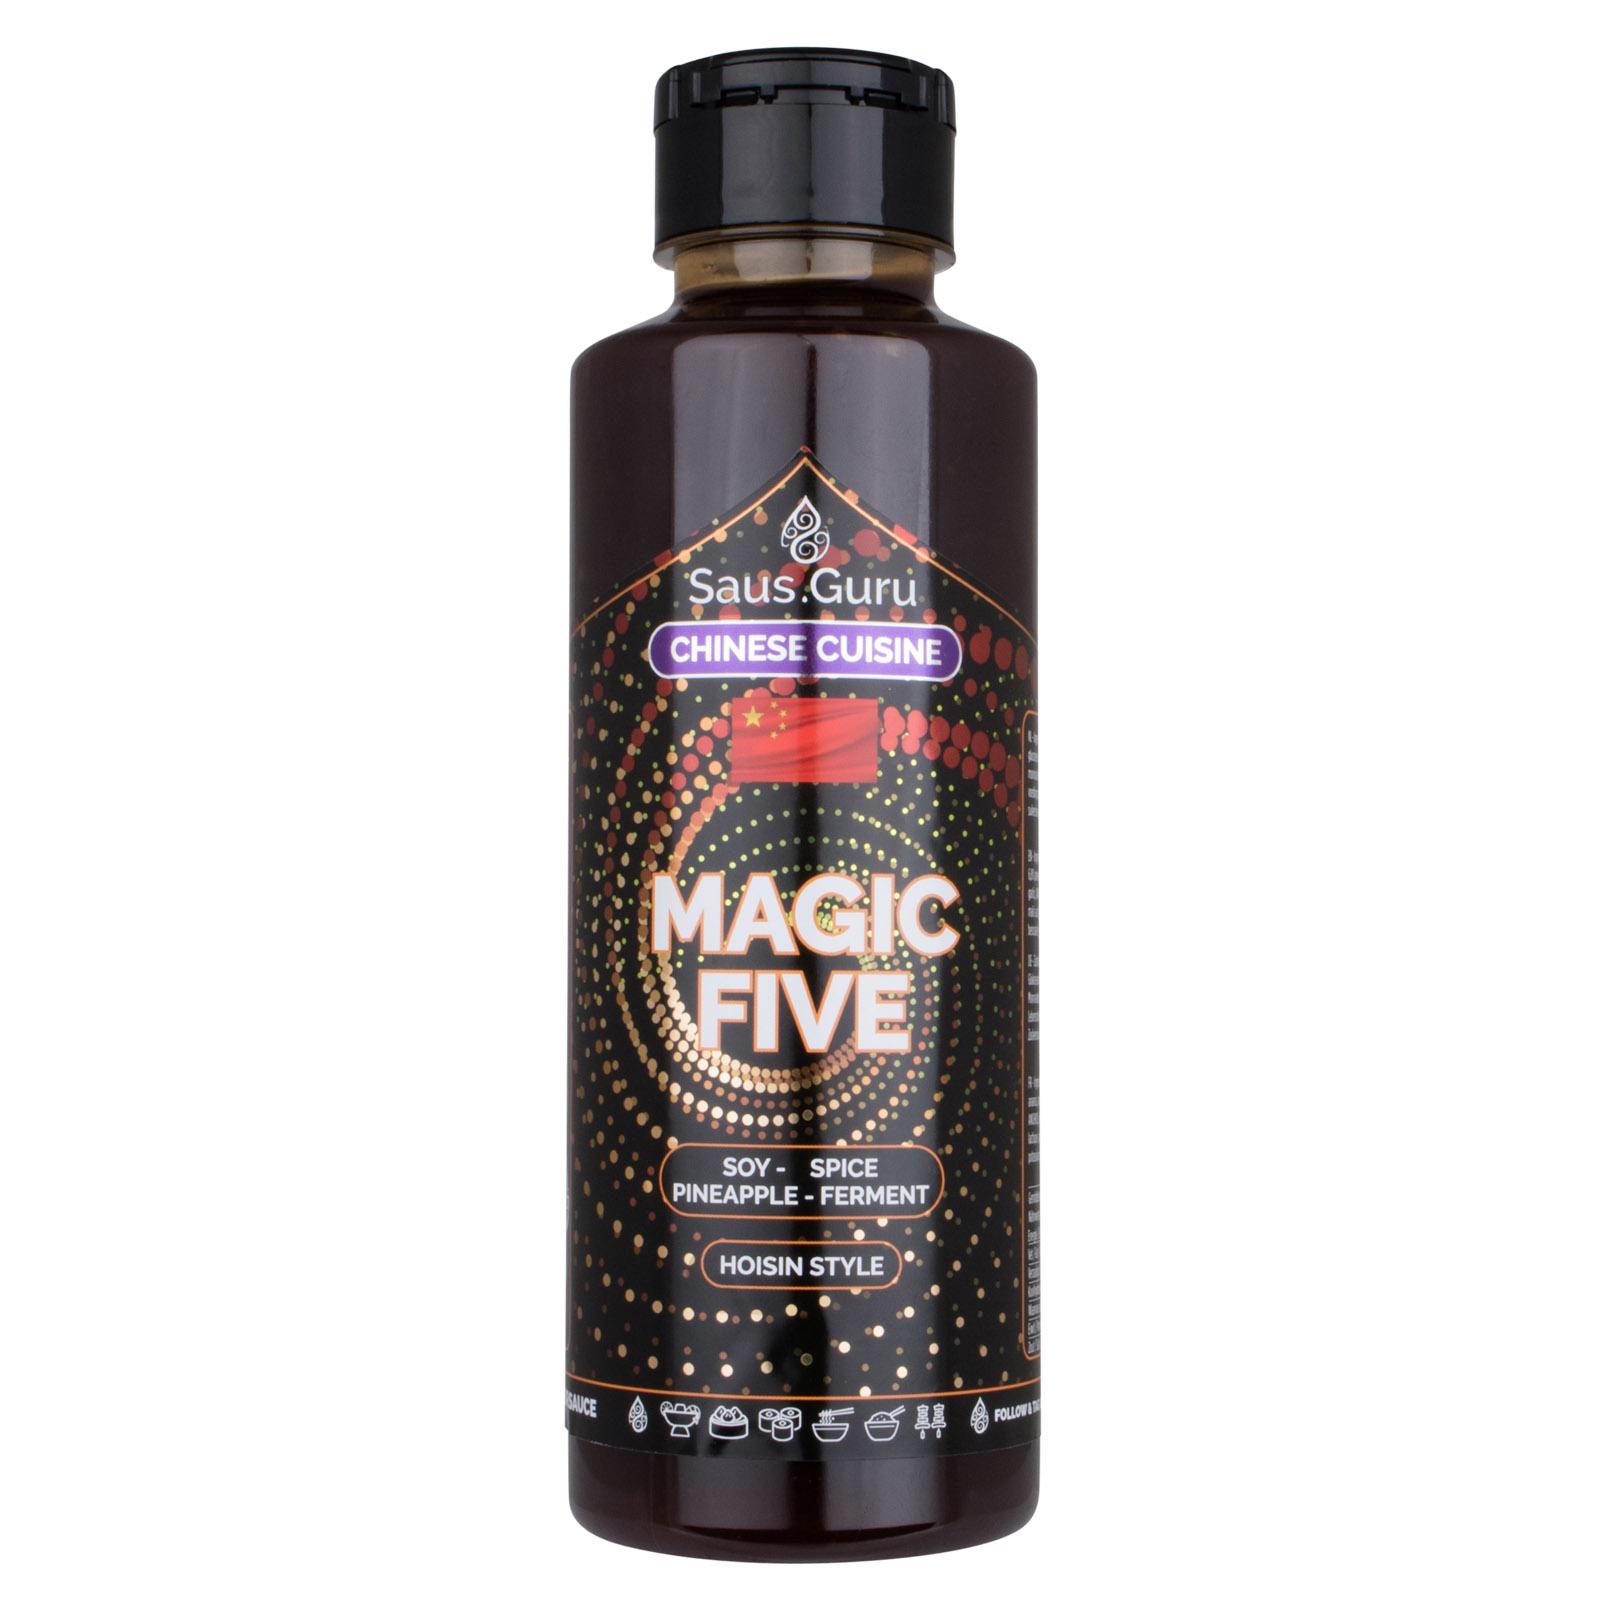 Saus.Guru's Magic Five-2